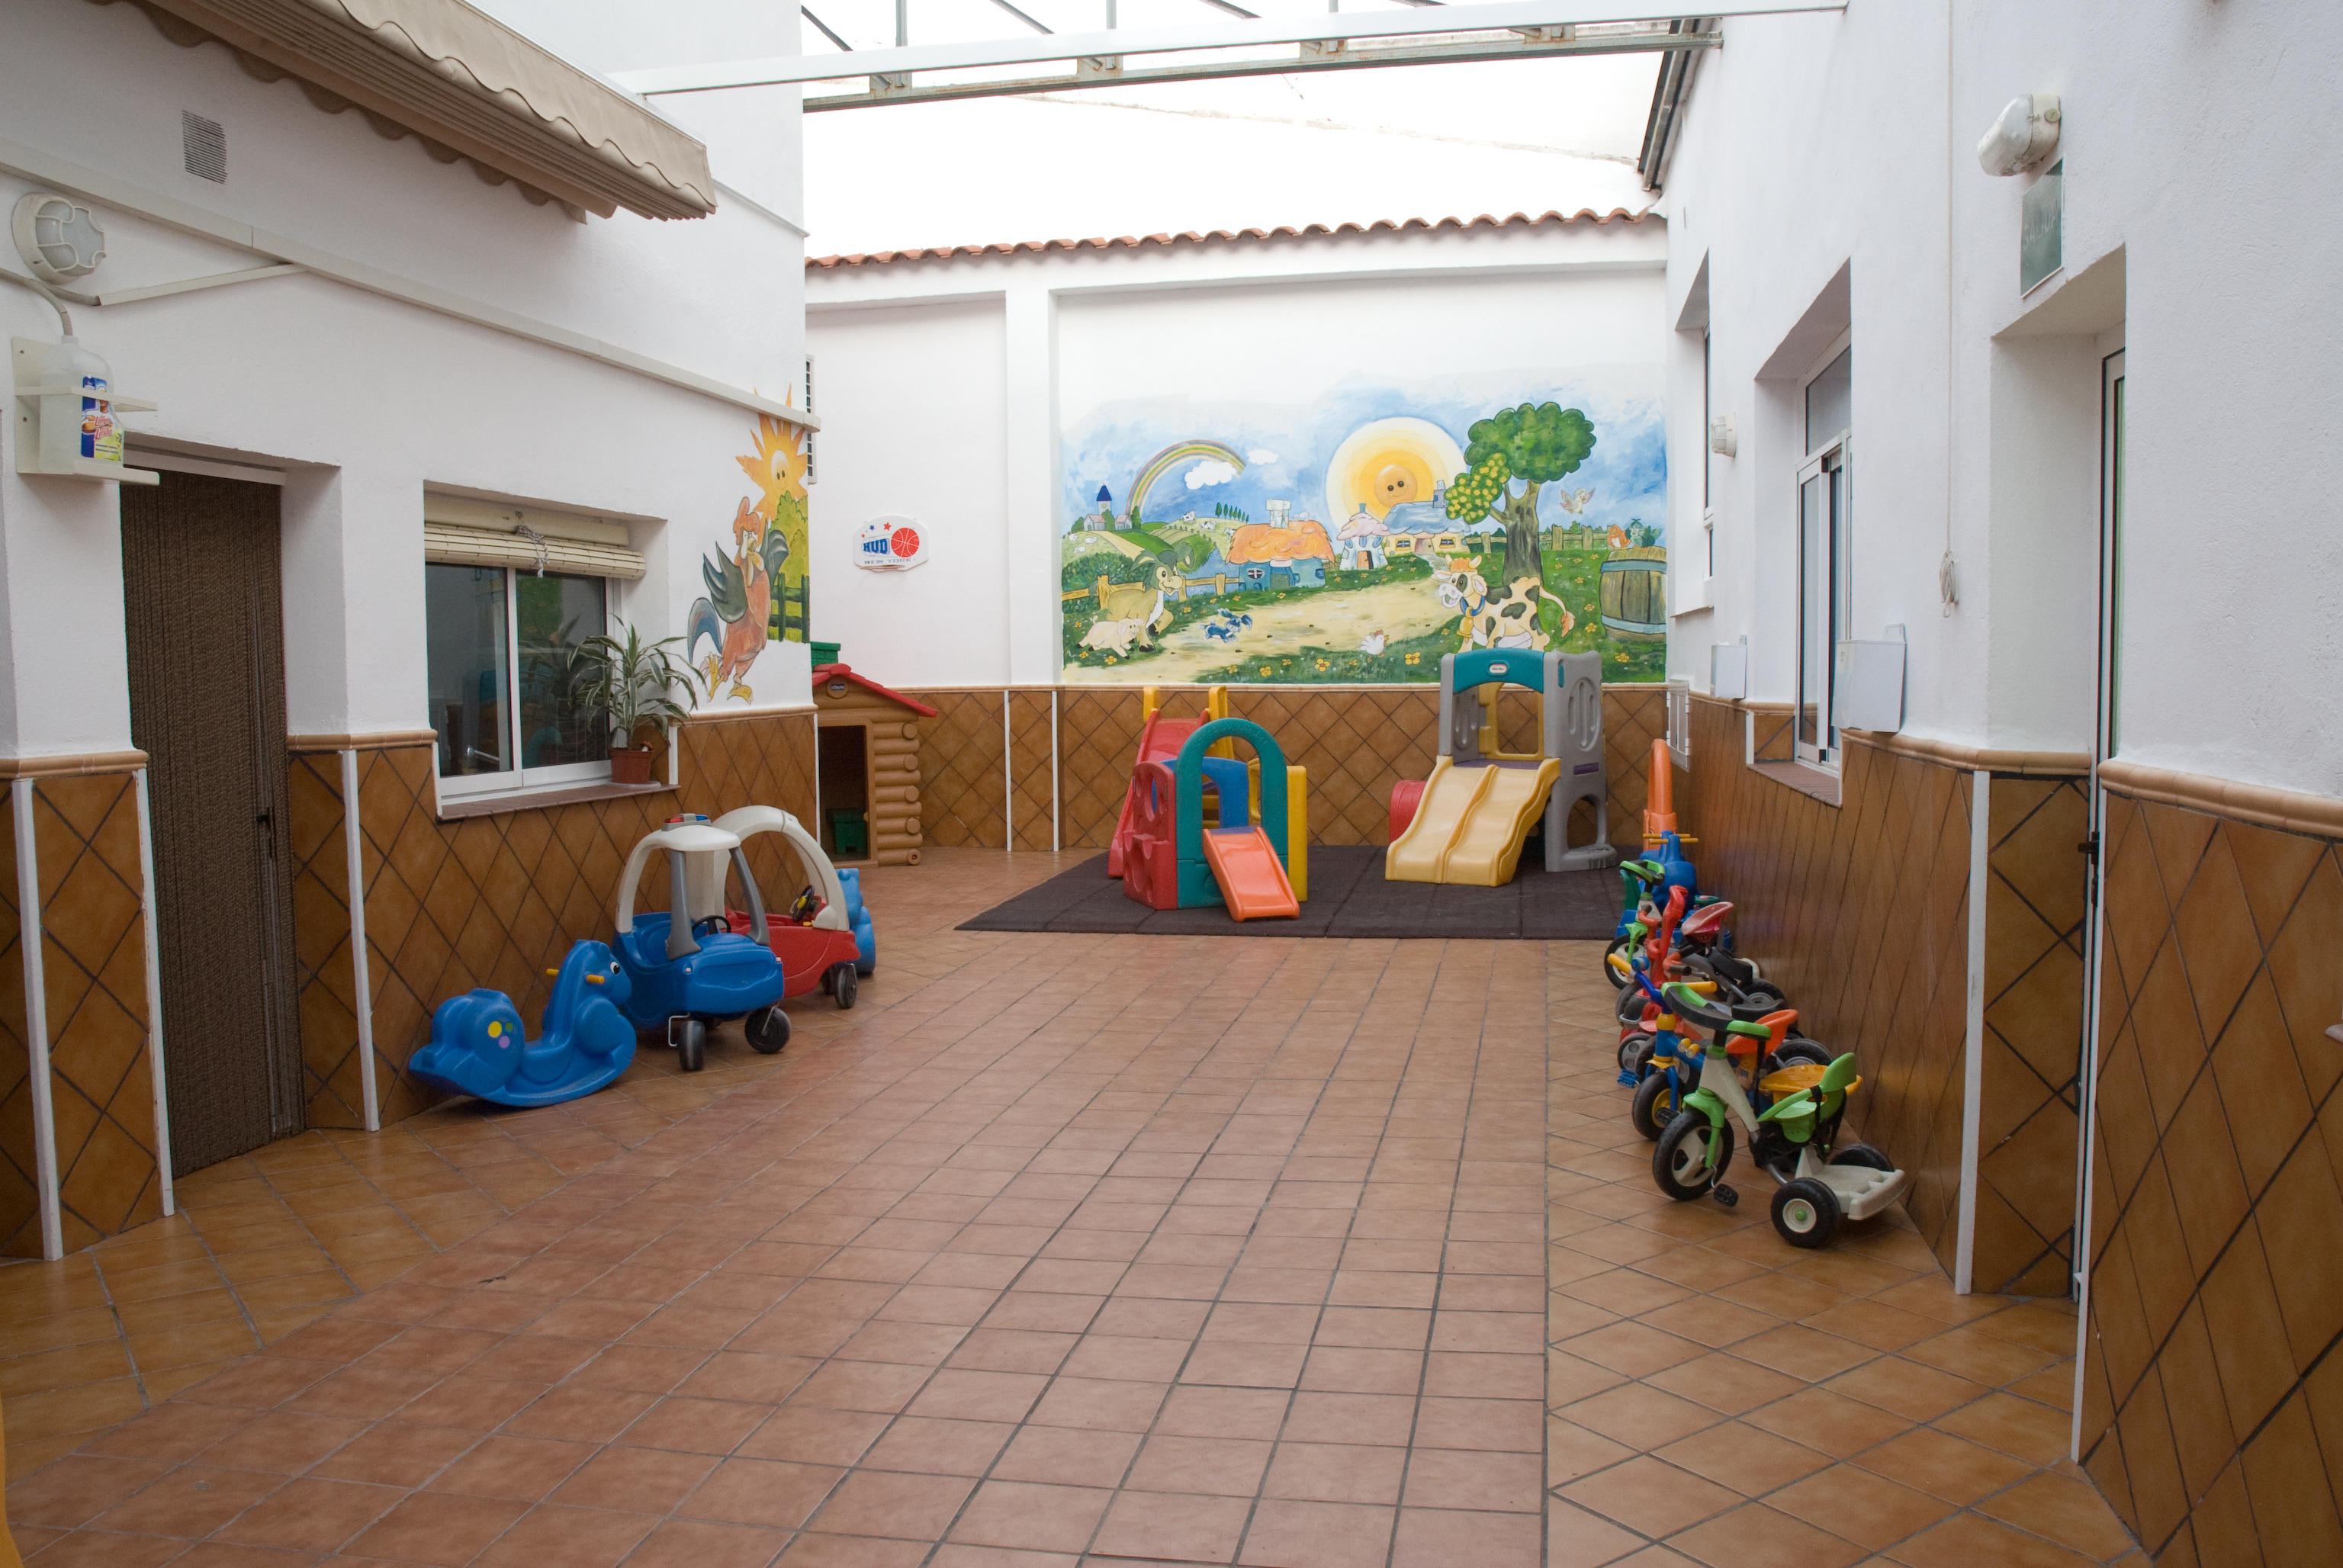 Centro de Educación Infantil Trazos